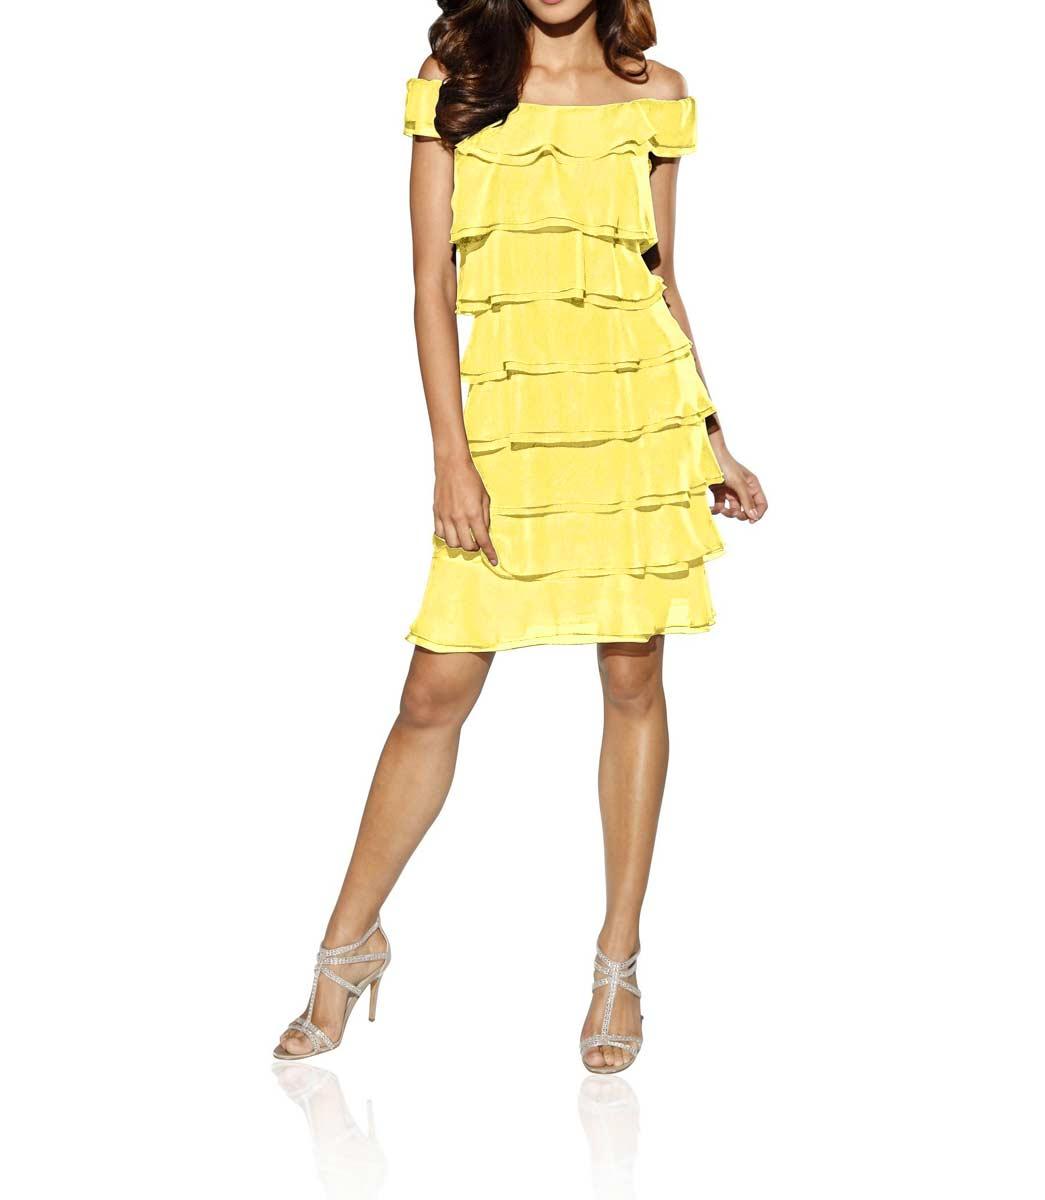 035.717 ASHLEY BROOKE Damen Designer-Volantkleid Gelb